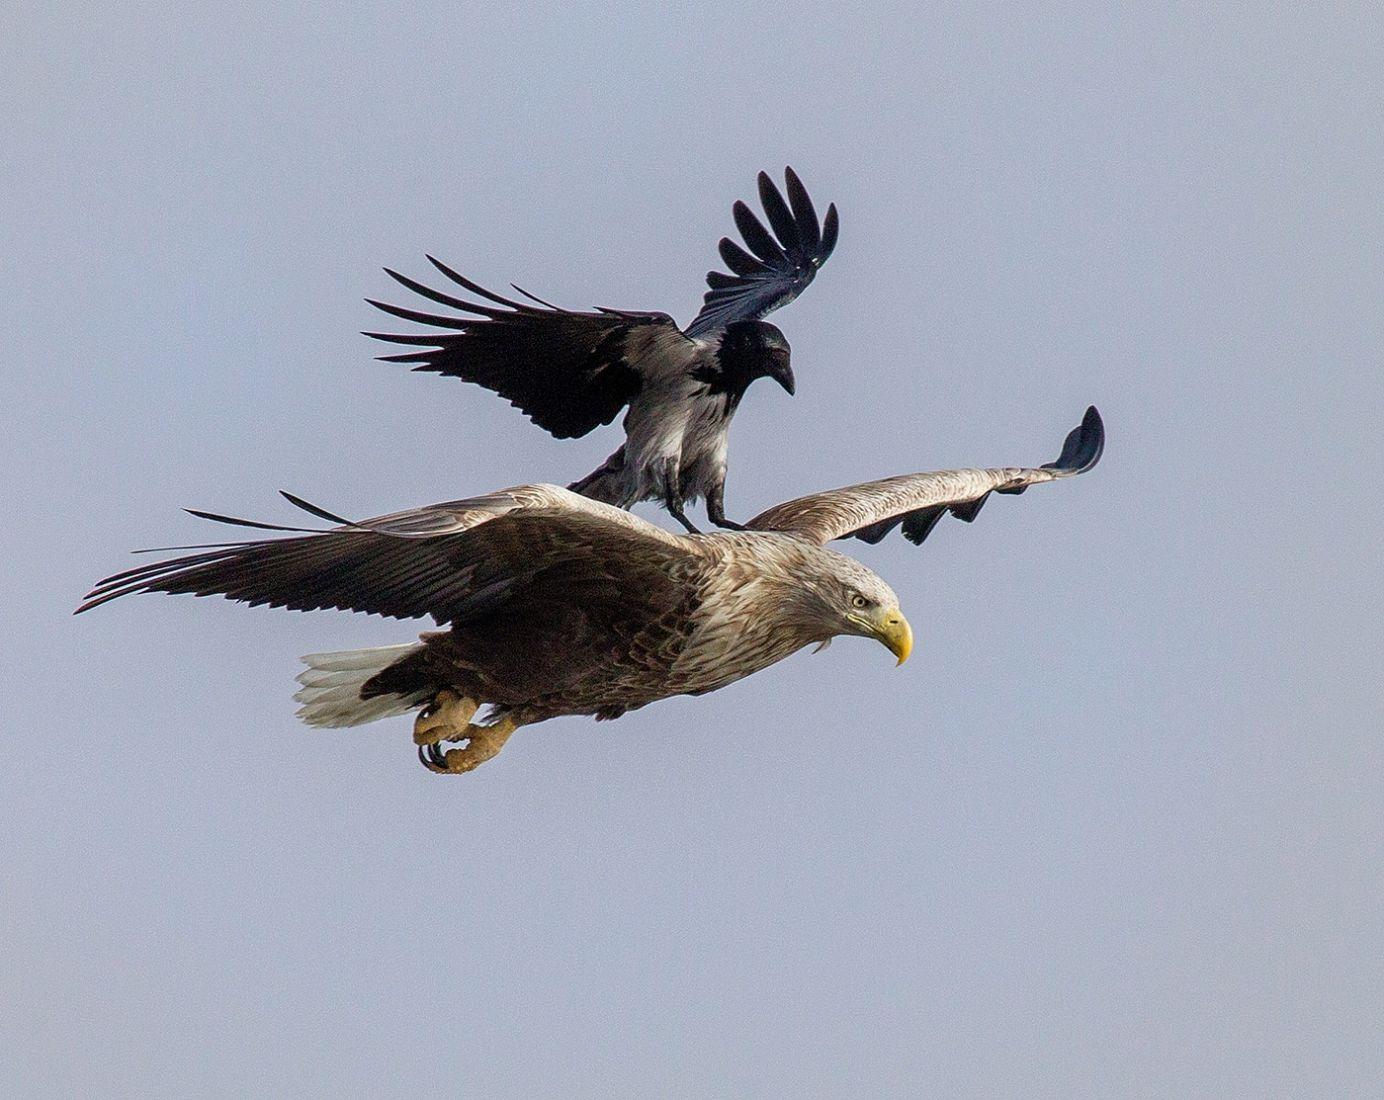 Flew, © Oleg Znobishchev, Birds Nomination, Most Beautiful Country Photo Contest